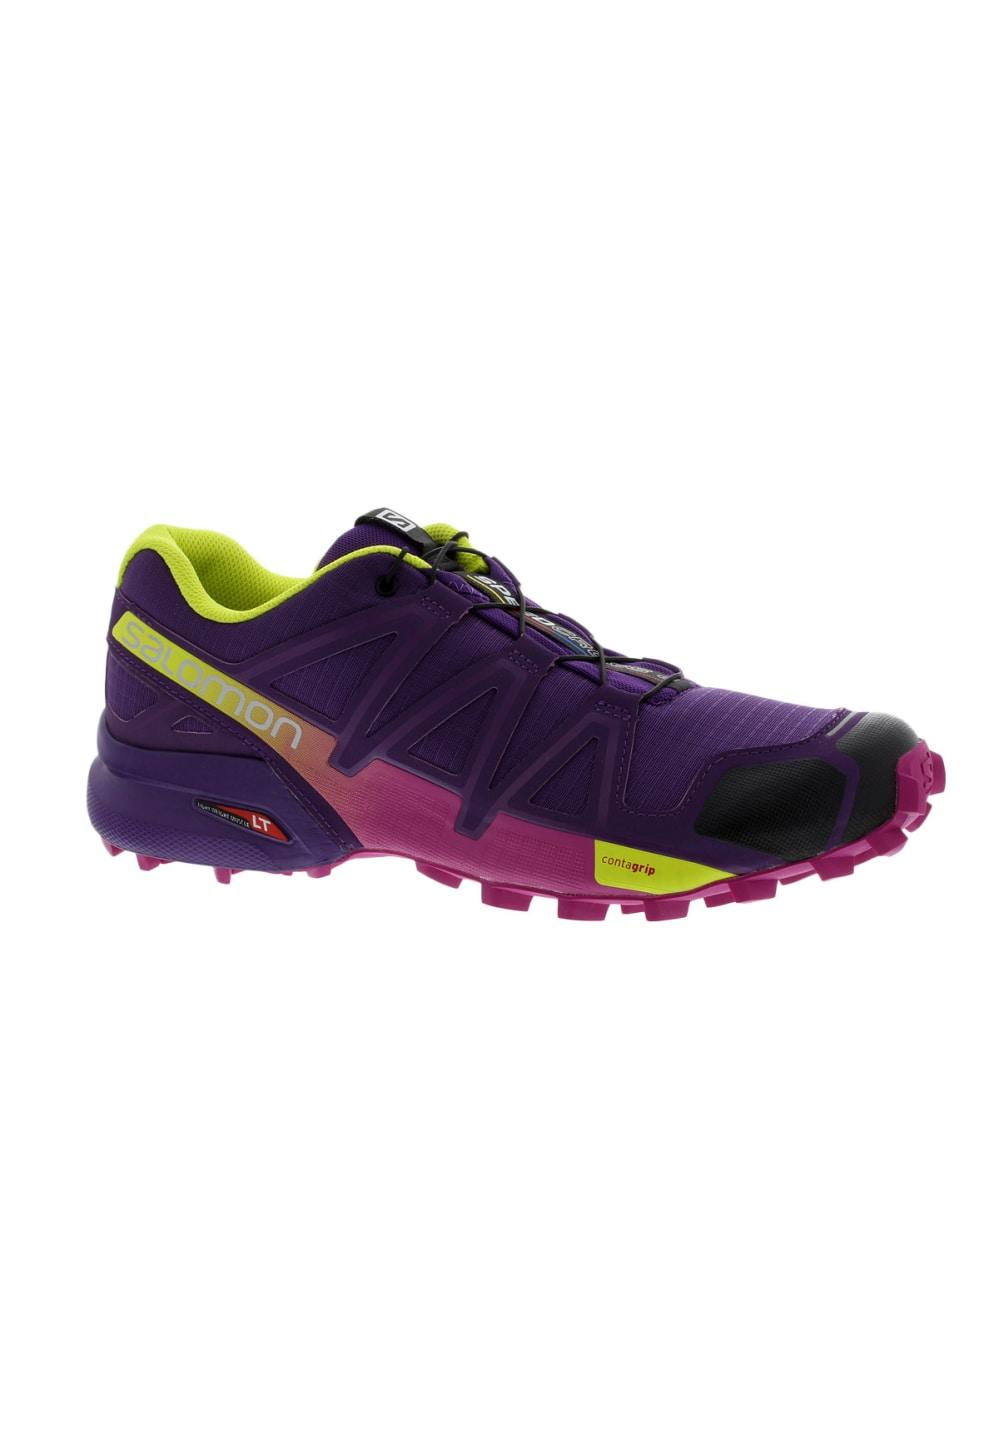 Salomon Femme Pour 4 Speedcross Running Chaussures Violet 54AcRL3jq